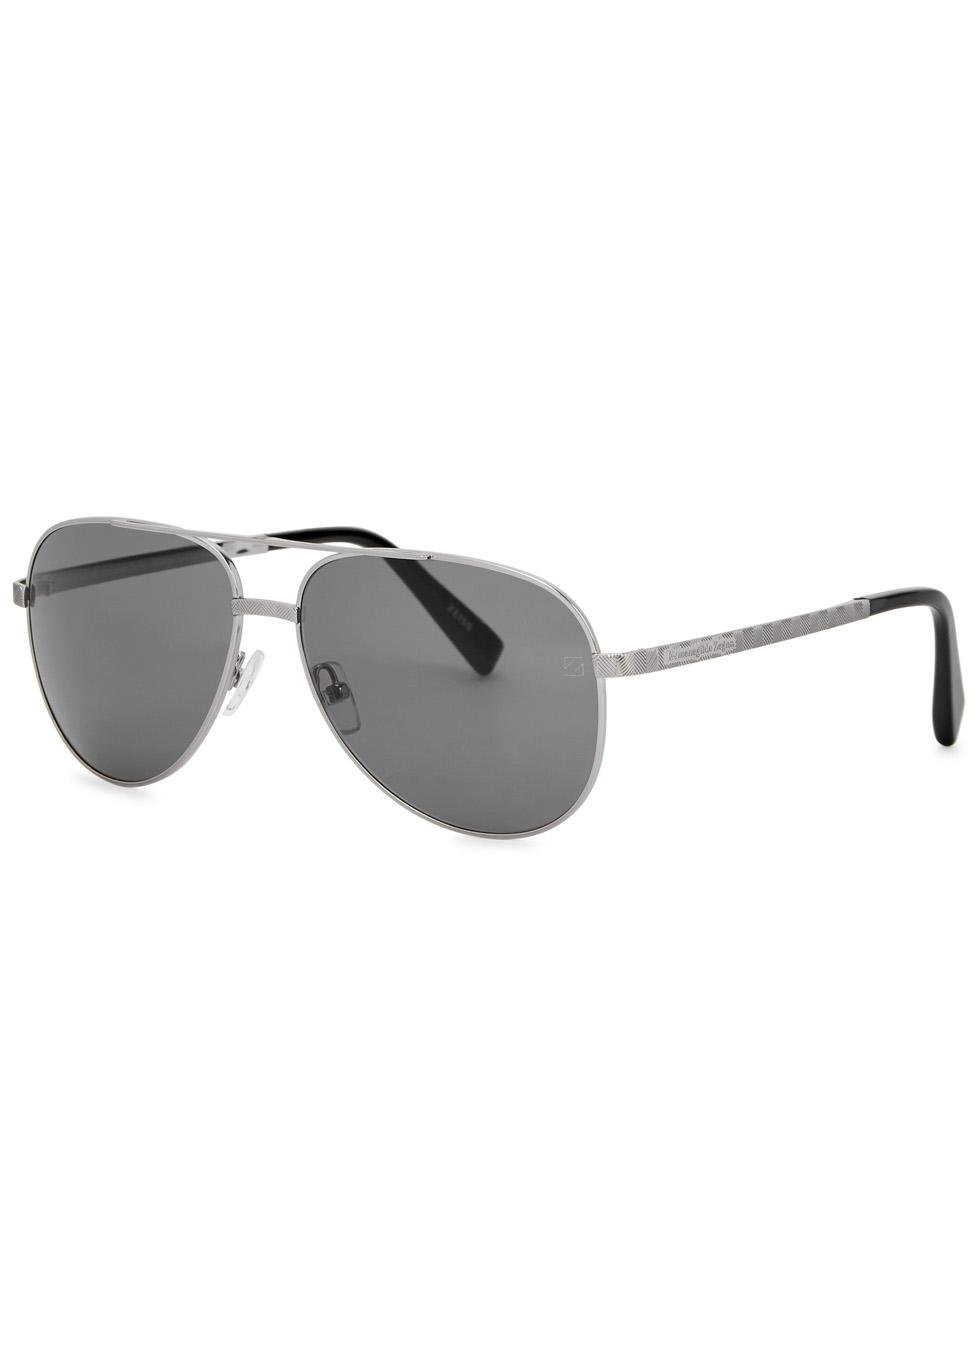 Silver Tone Aviator-Style Sunglasses, Grey